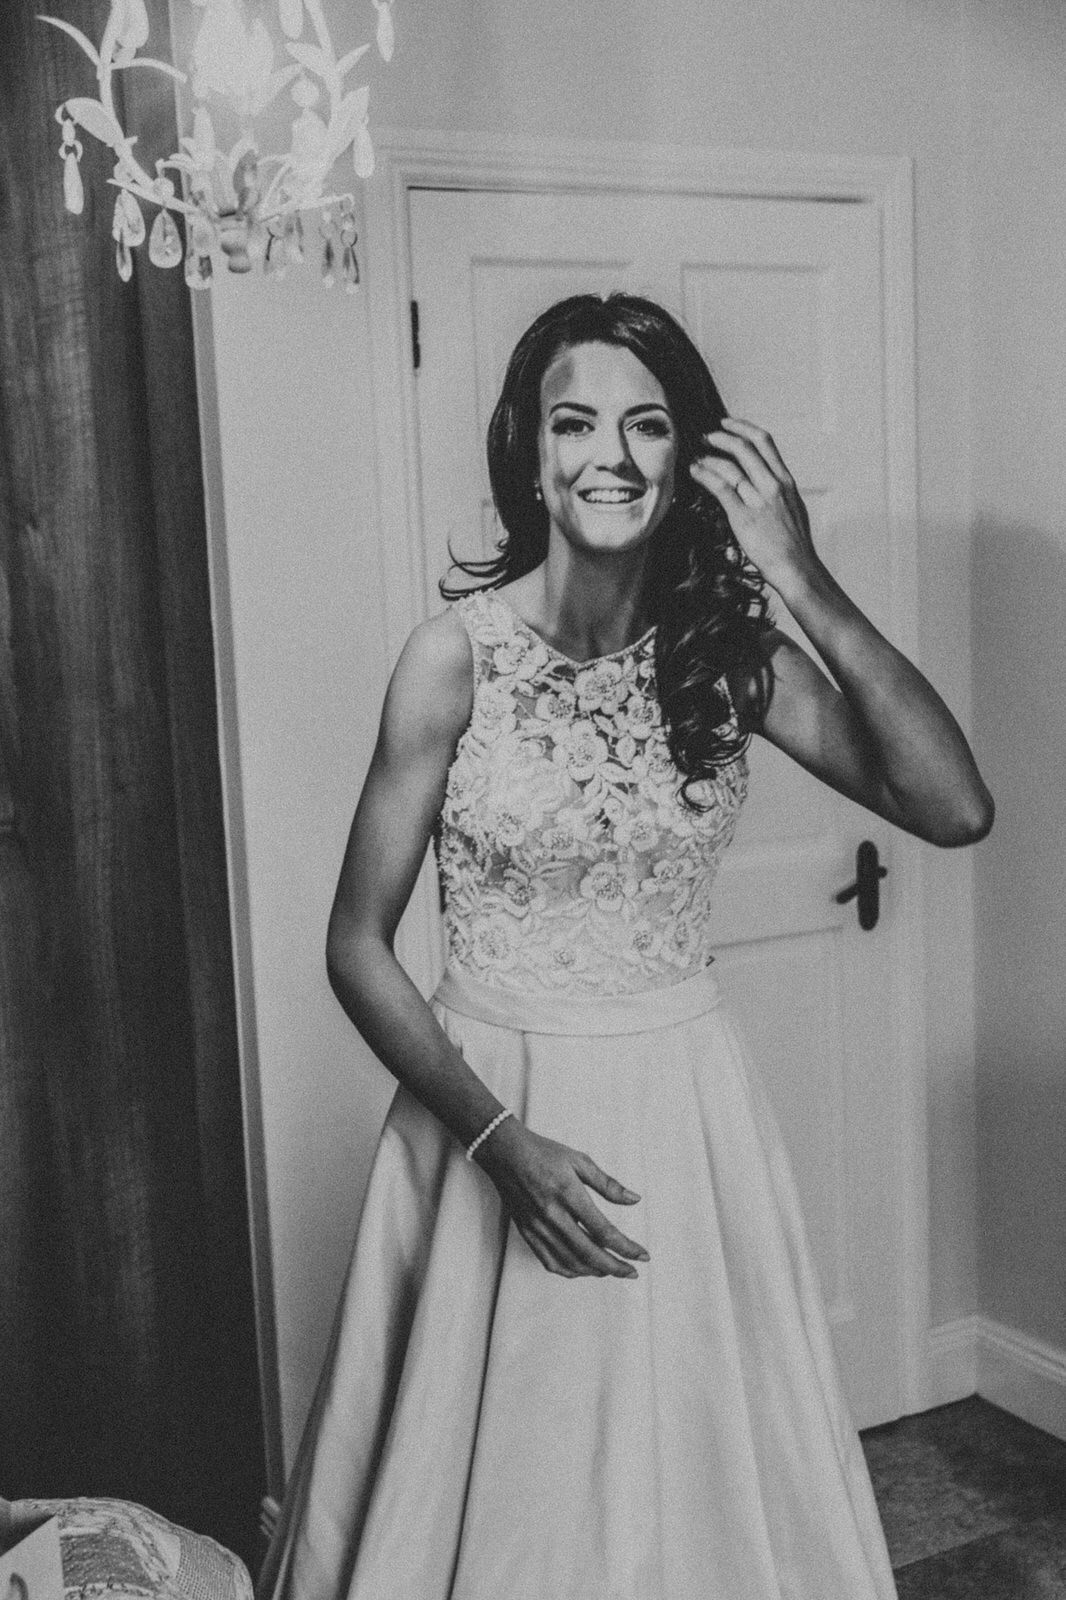 Roger_Kenny_wedding_photographer_410.jpg